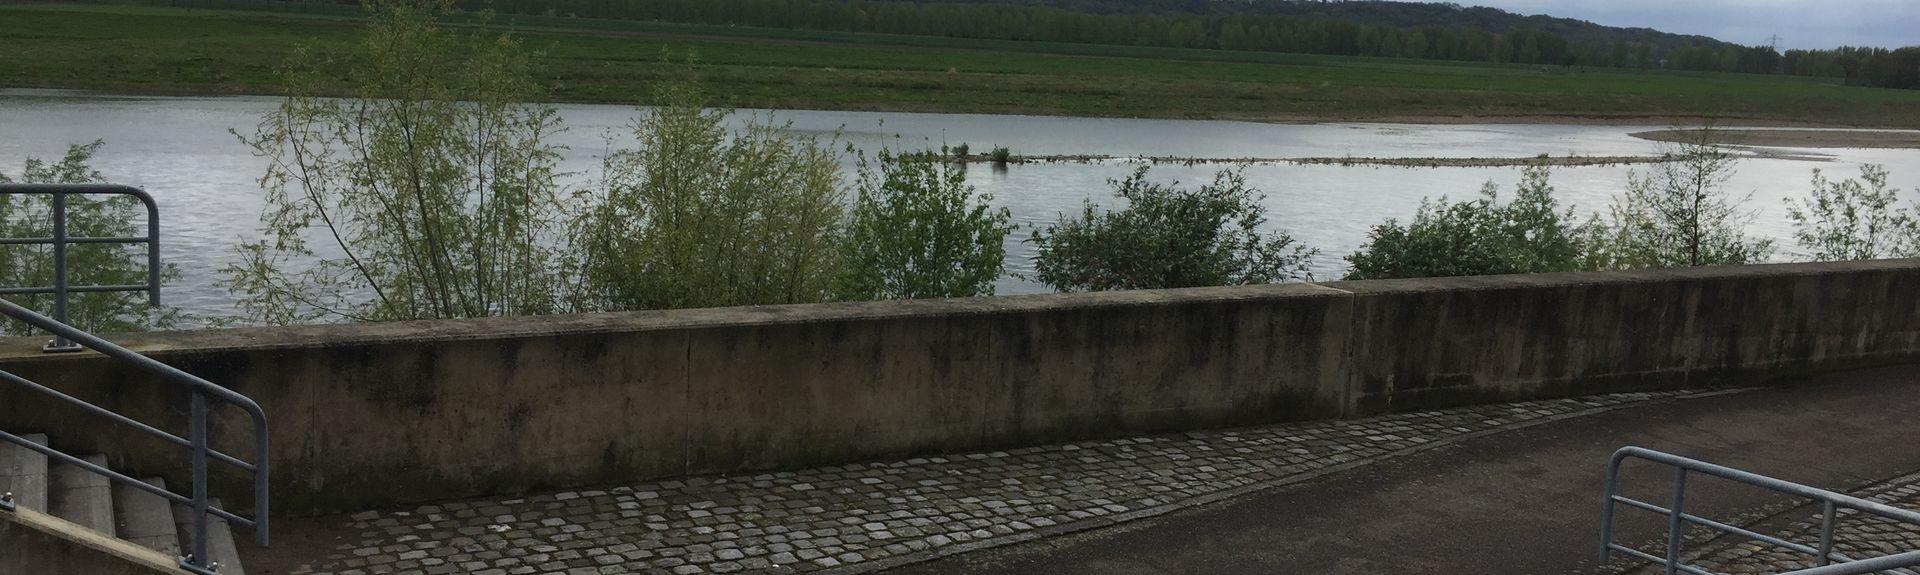 Hasselt Station, Hasselt, Flanders, BE